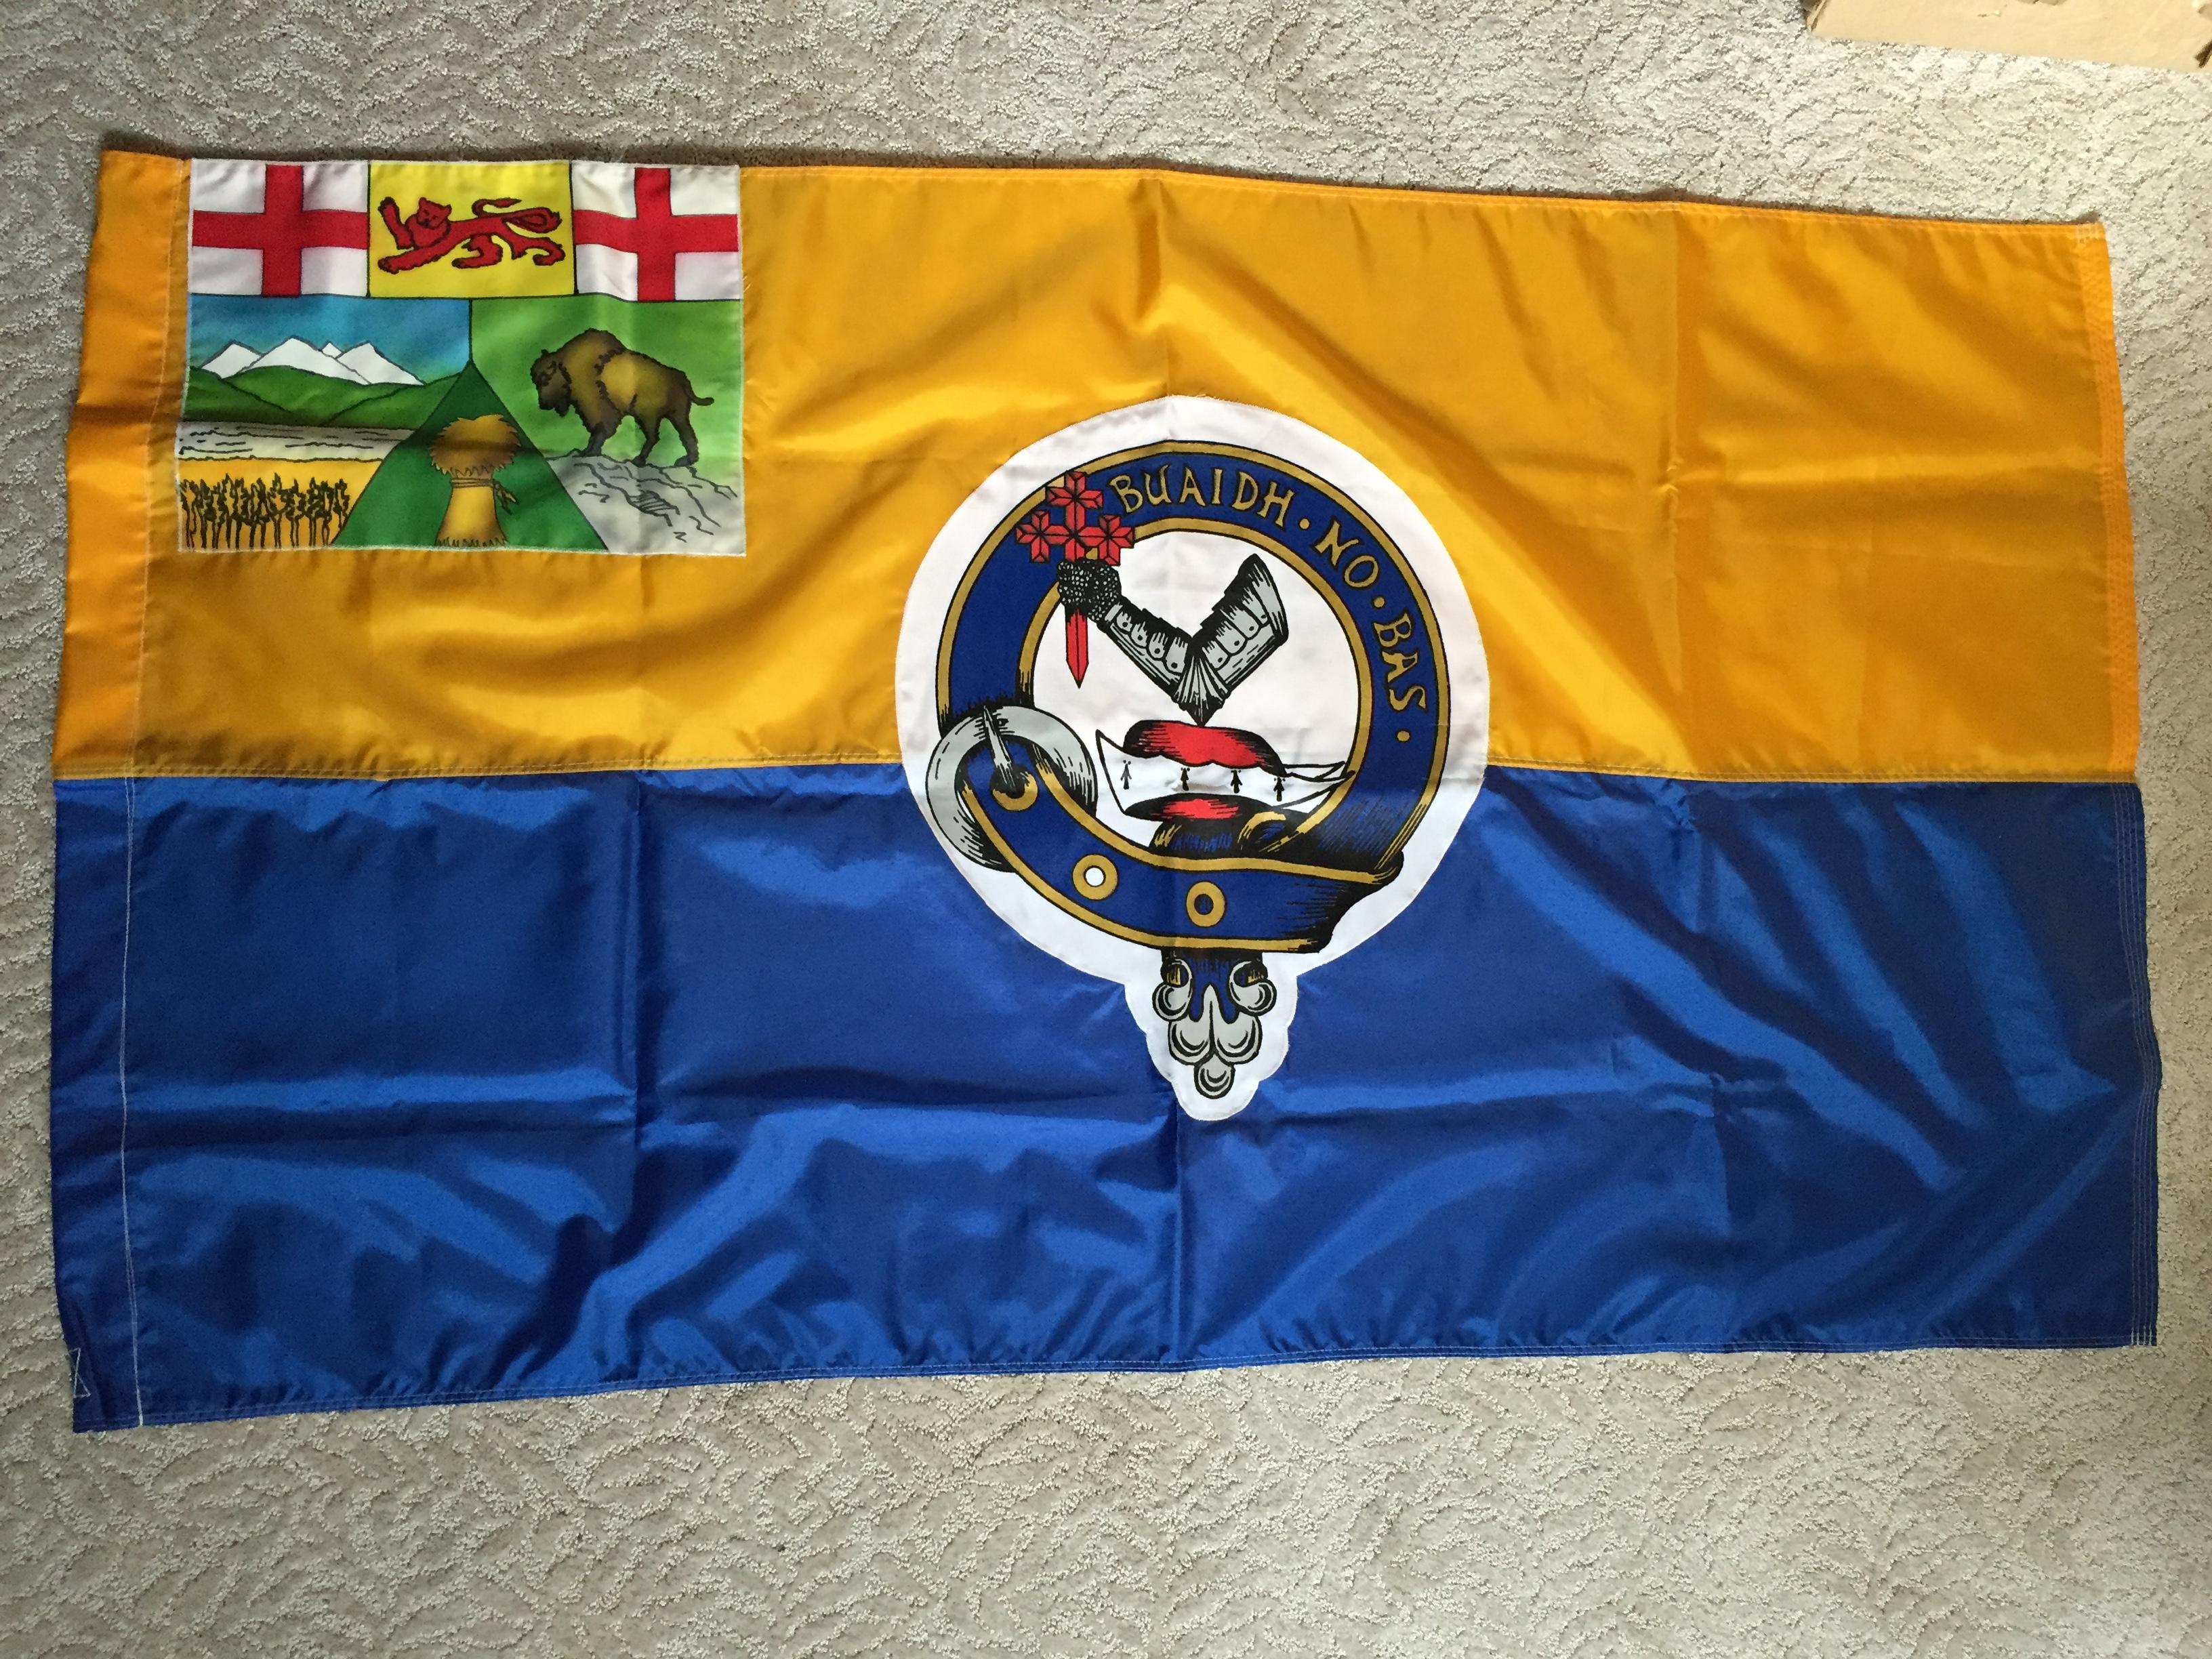 Canada-West-Society-Flag-2-IMG_6344